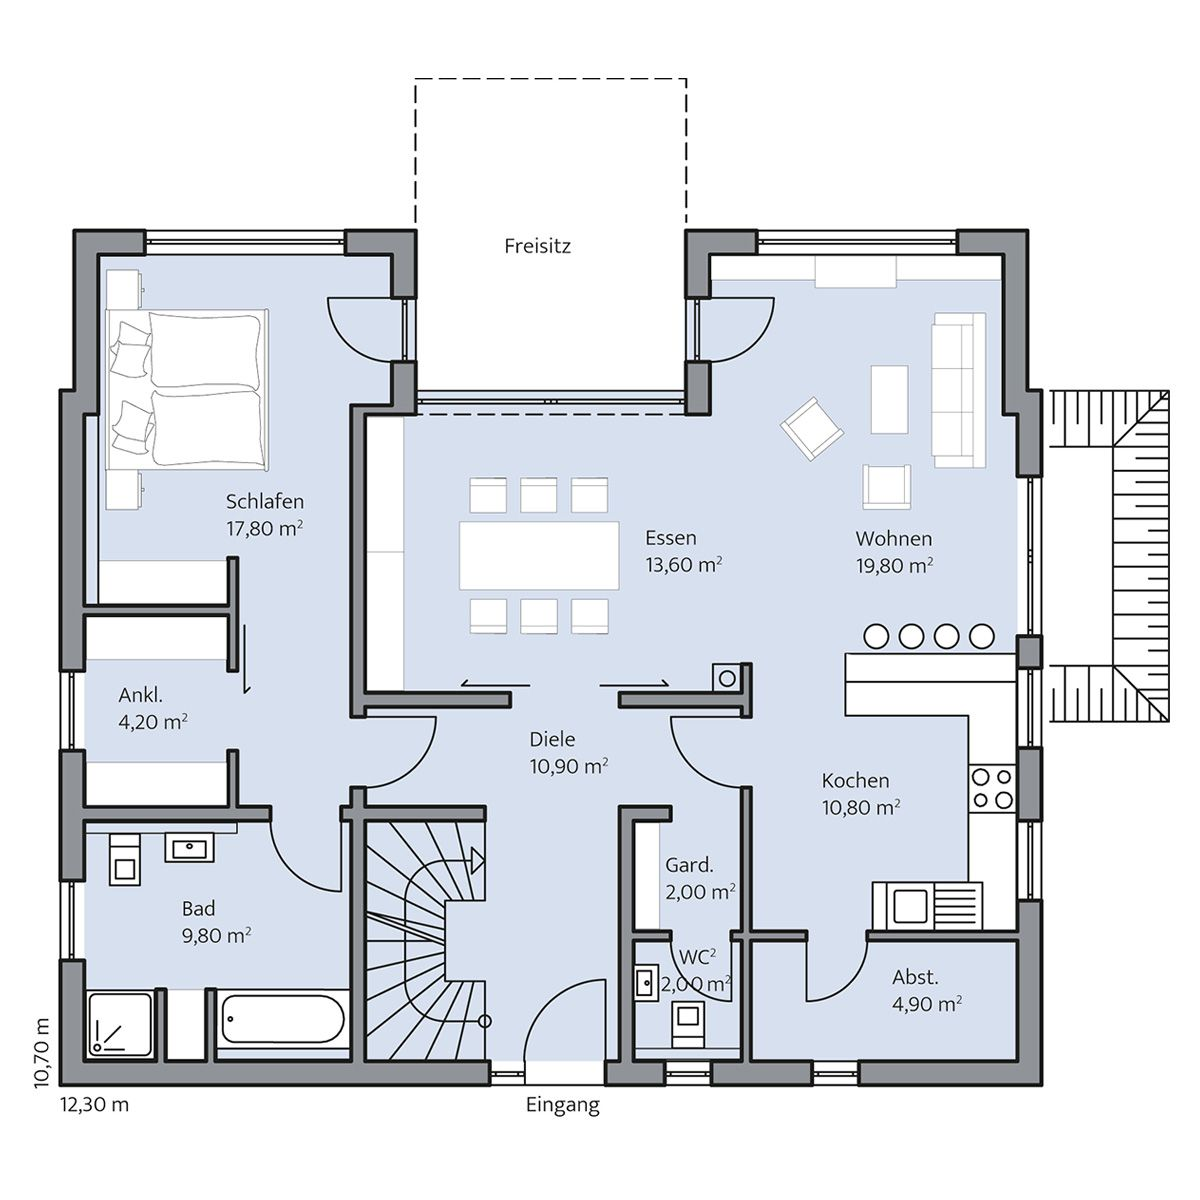 pin von katja morasch auf grundriss zweigeschoss pinterest erdgeschoss grundrisse und. Black Bedroom Furniture Sets. Home Design Ideas